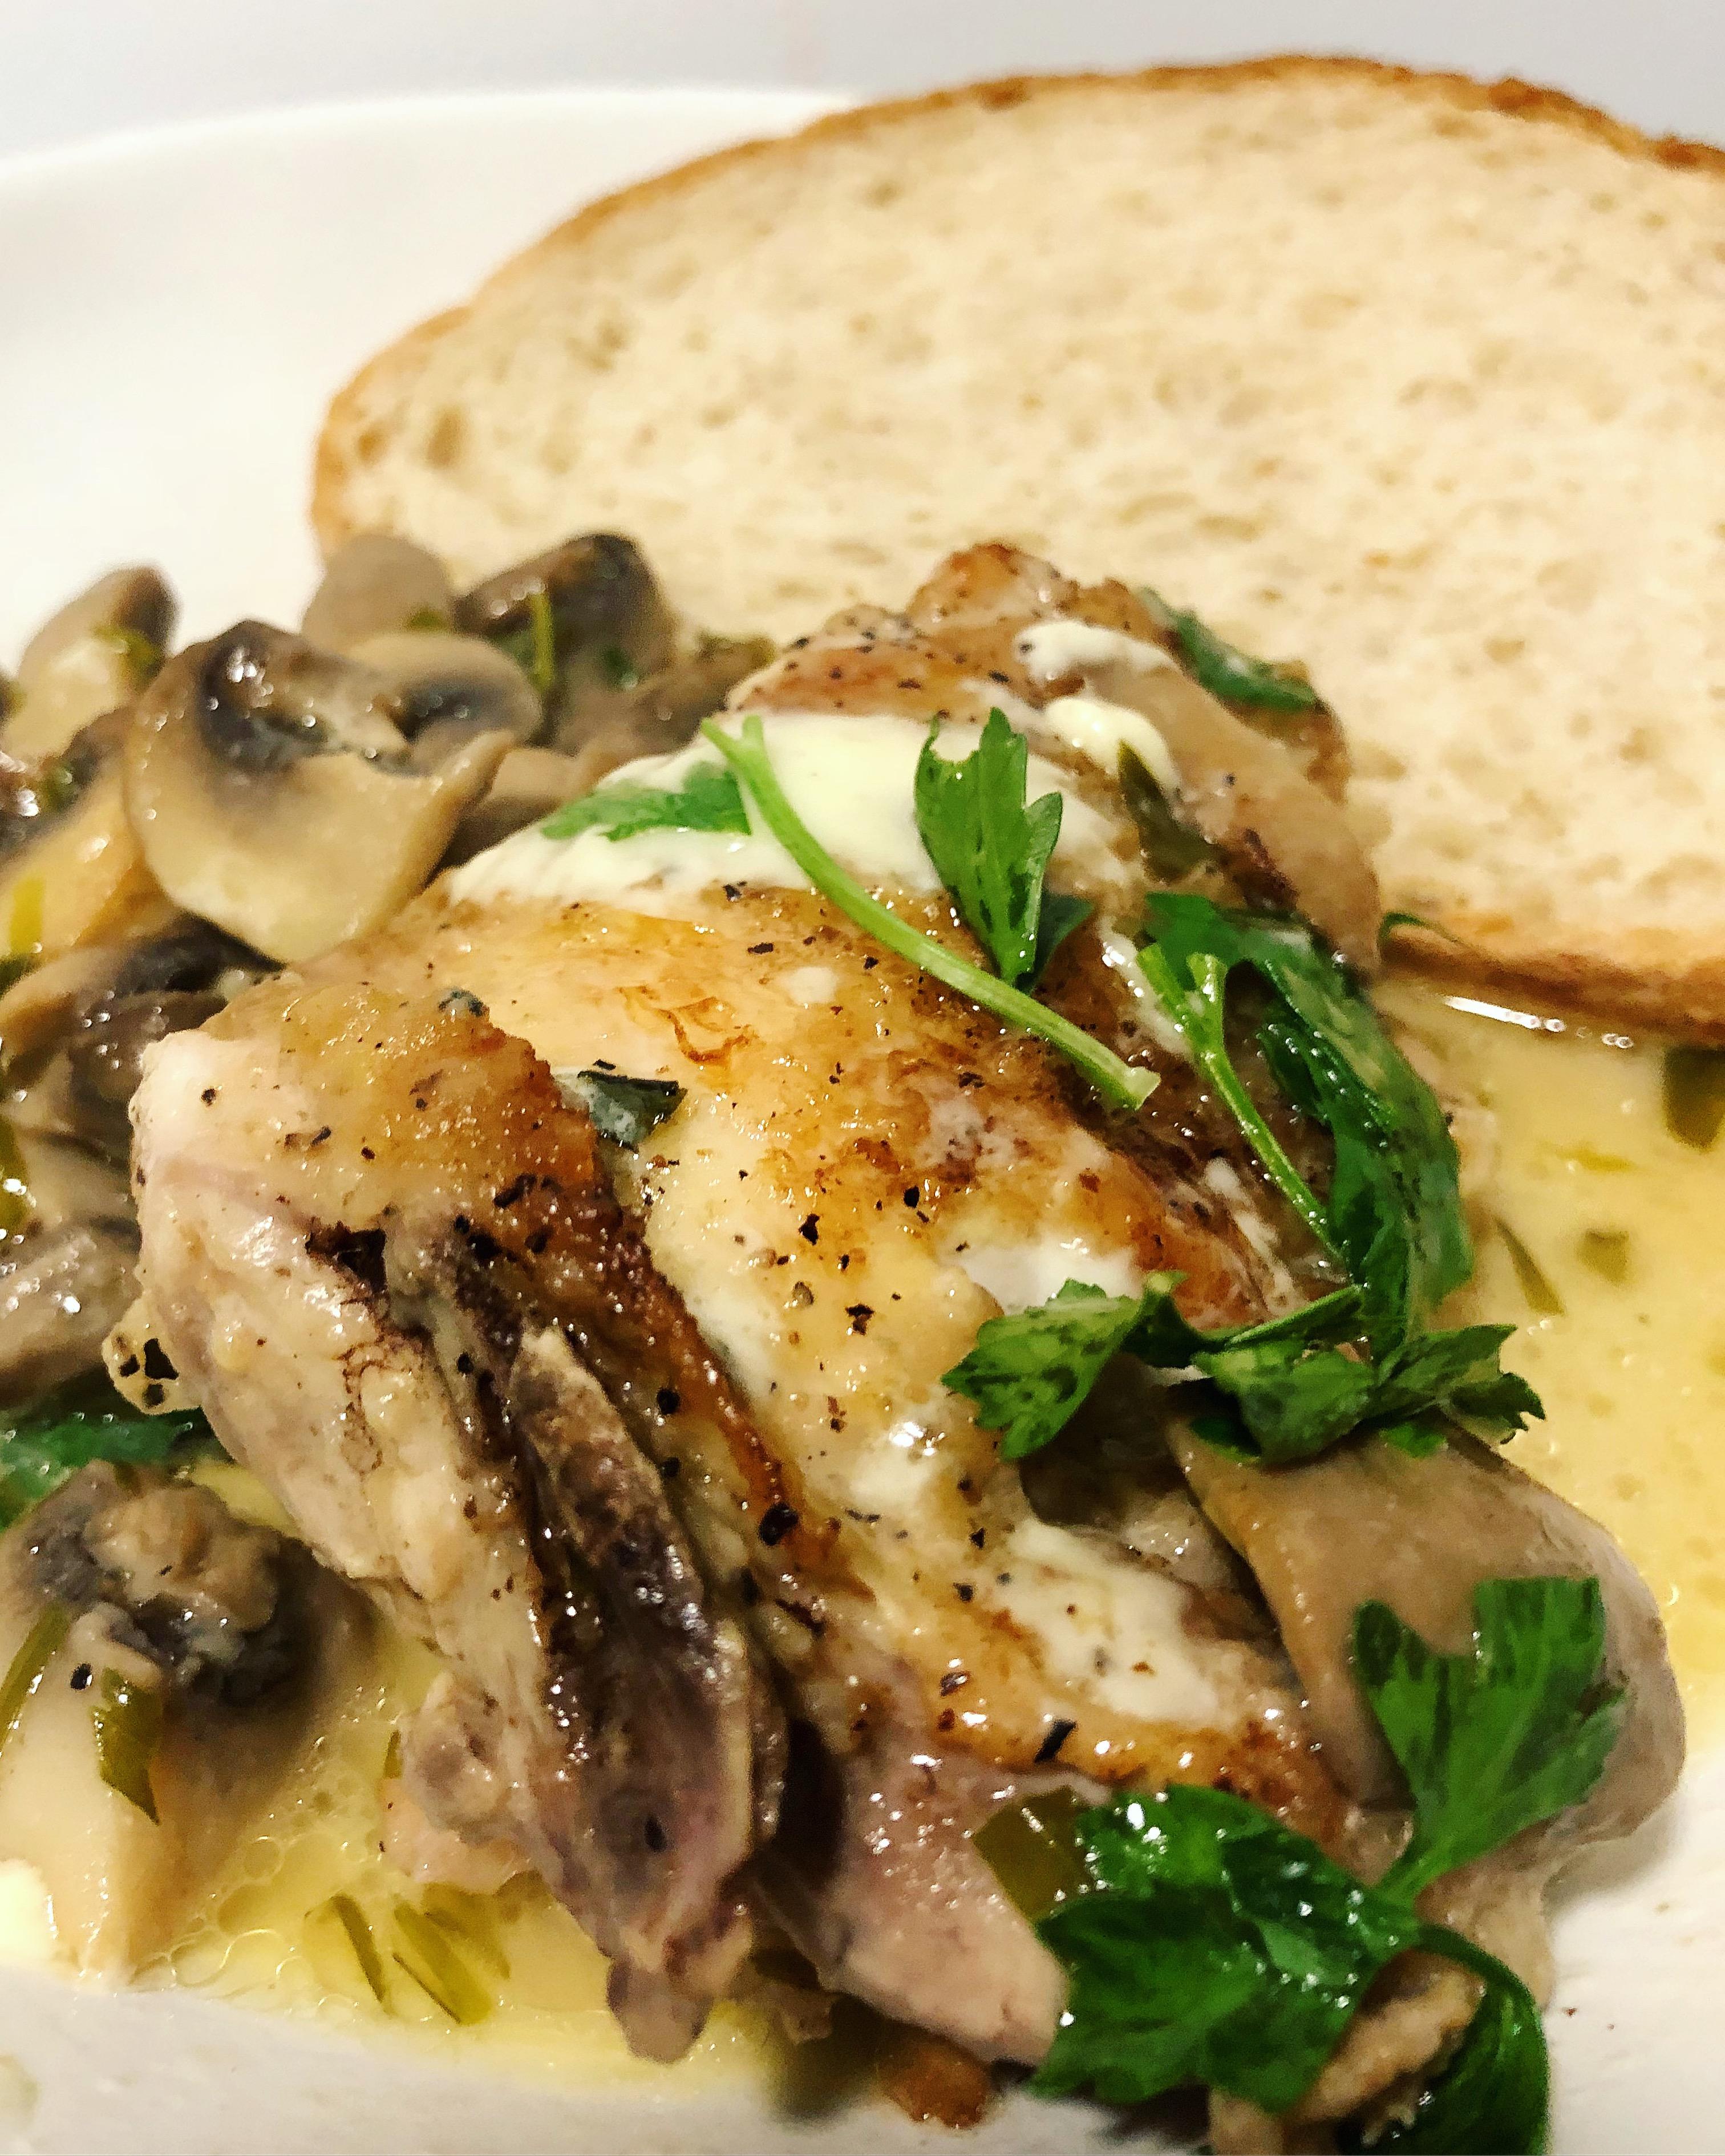 Baked Chicken with Mushrooms & Gorgonzola